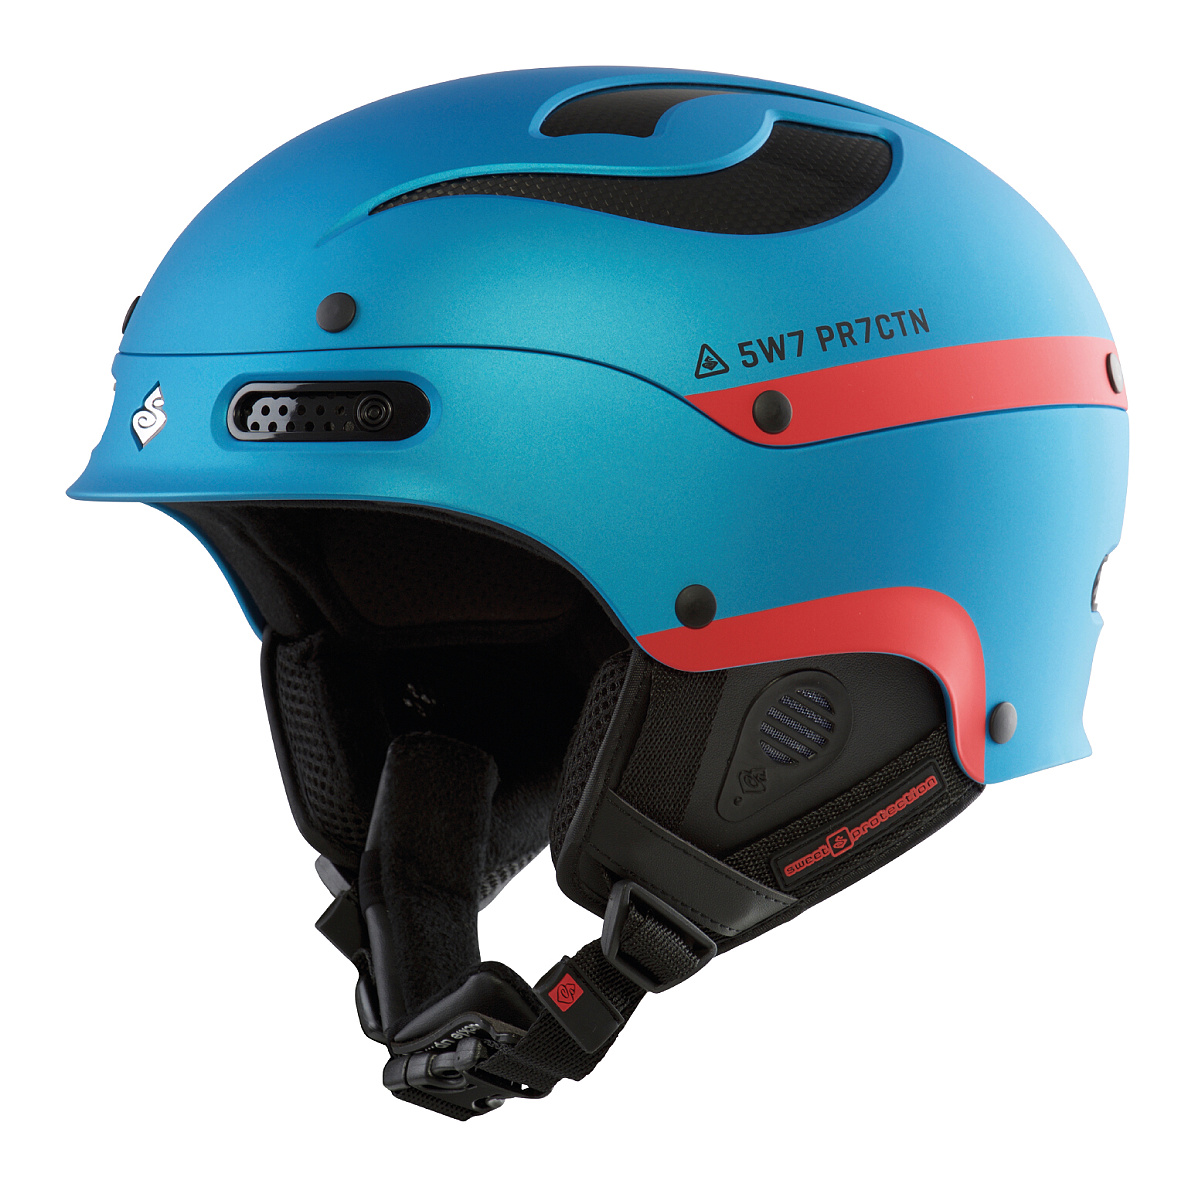 trooper-matte_steel_blue_metallic-front_preview